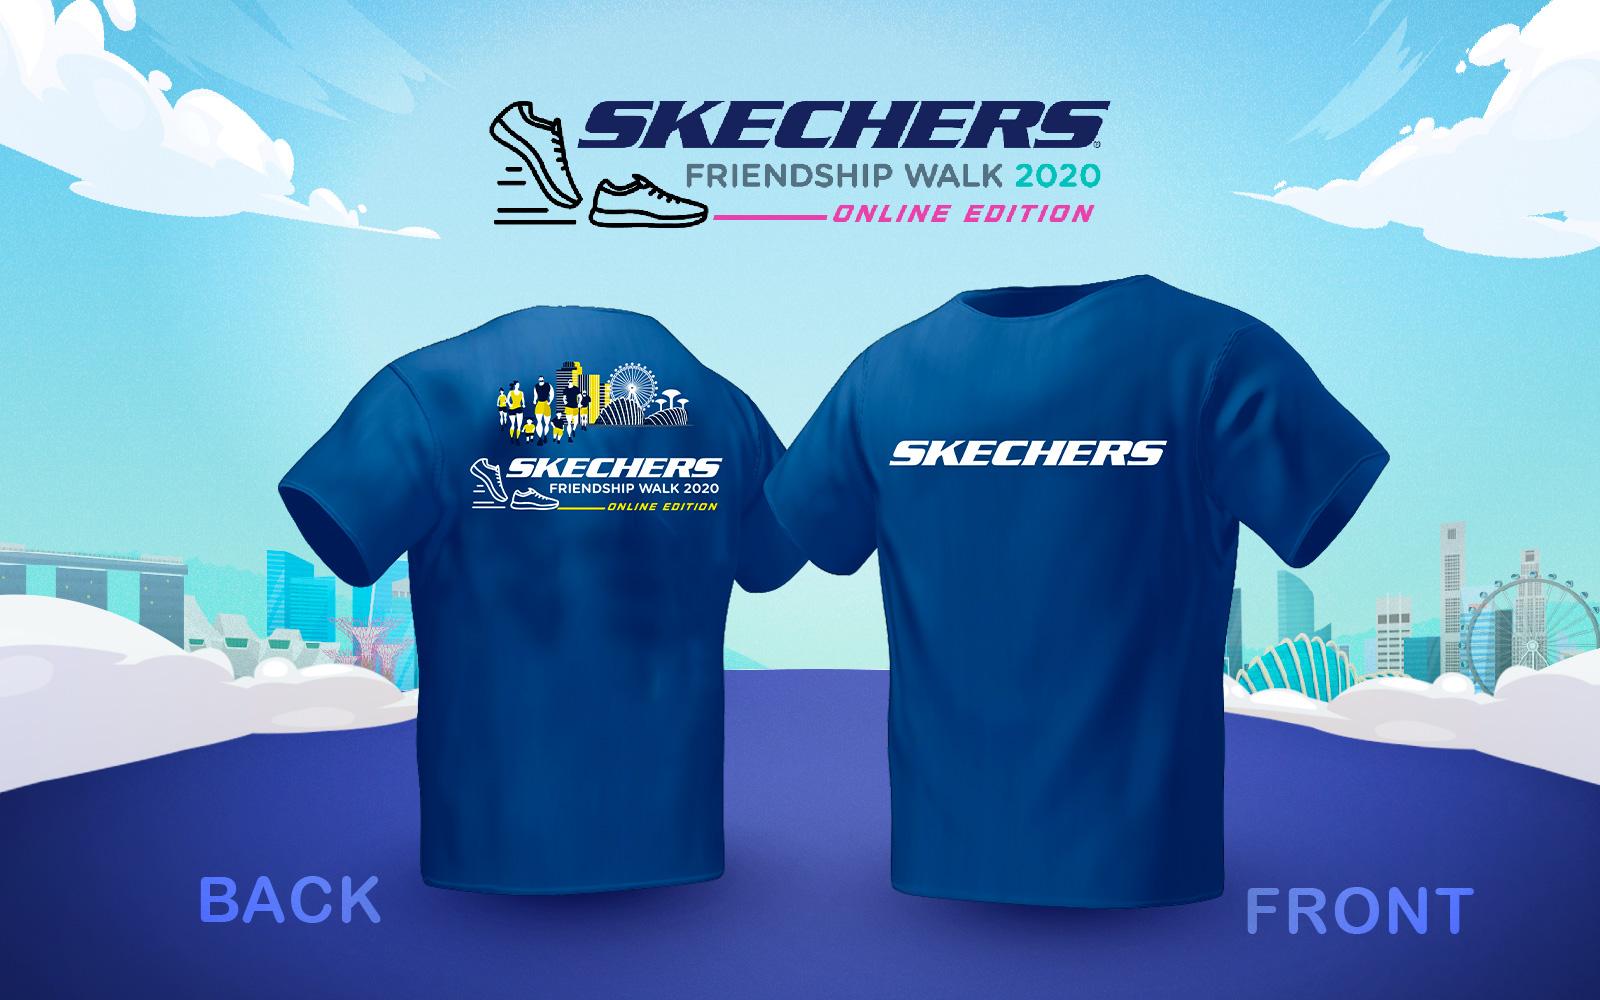 Skechers Friendship Walk 2020 t-shirts